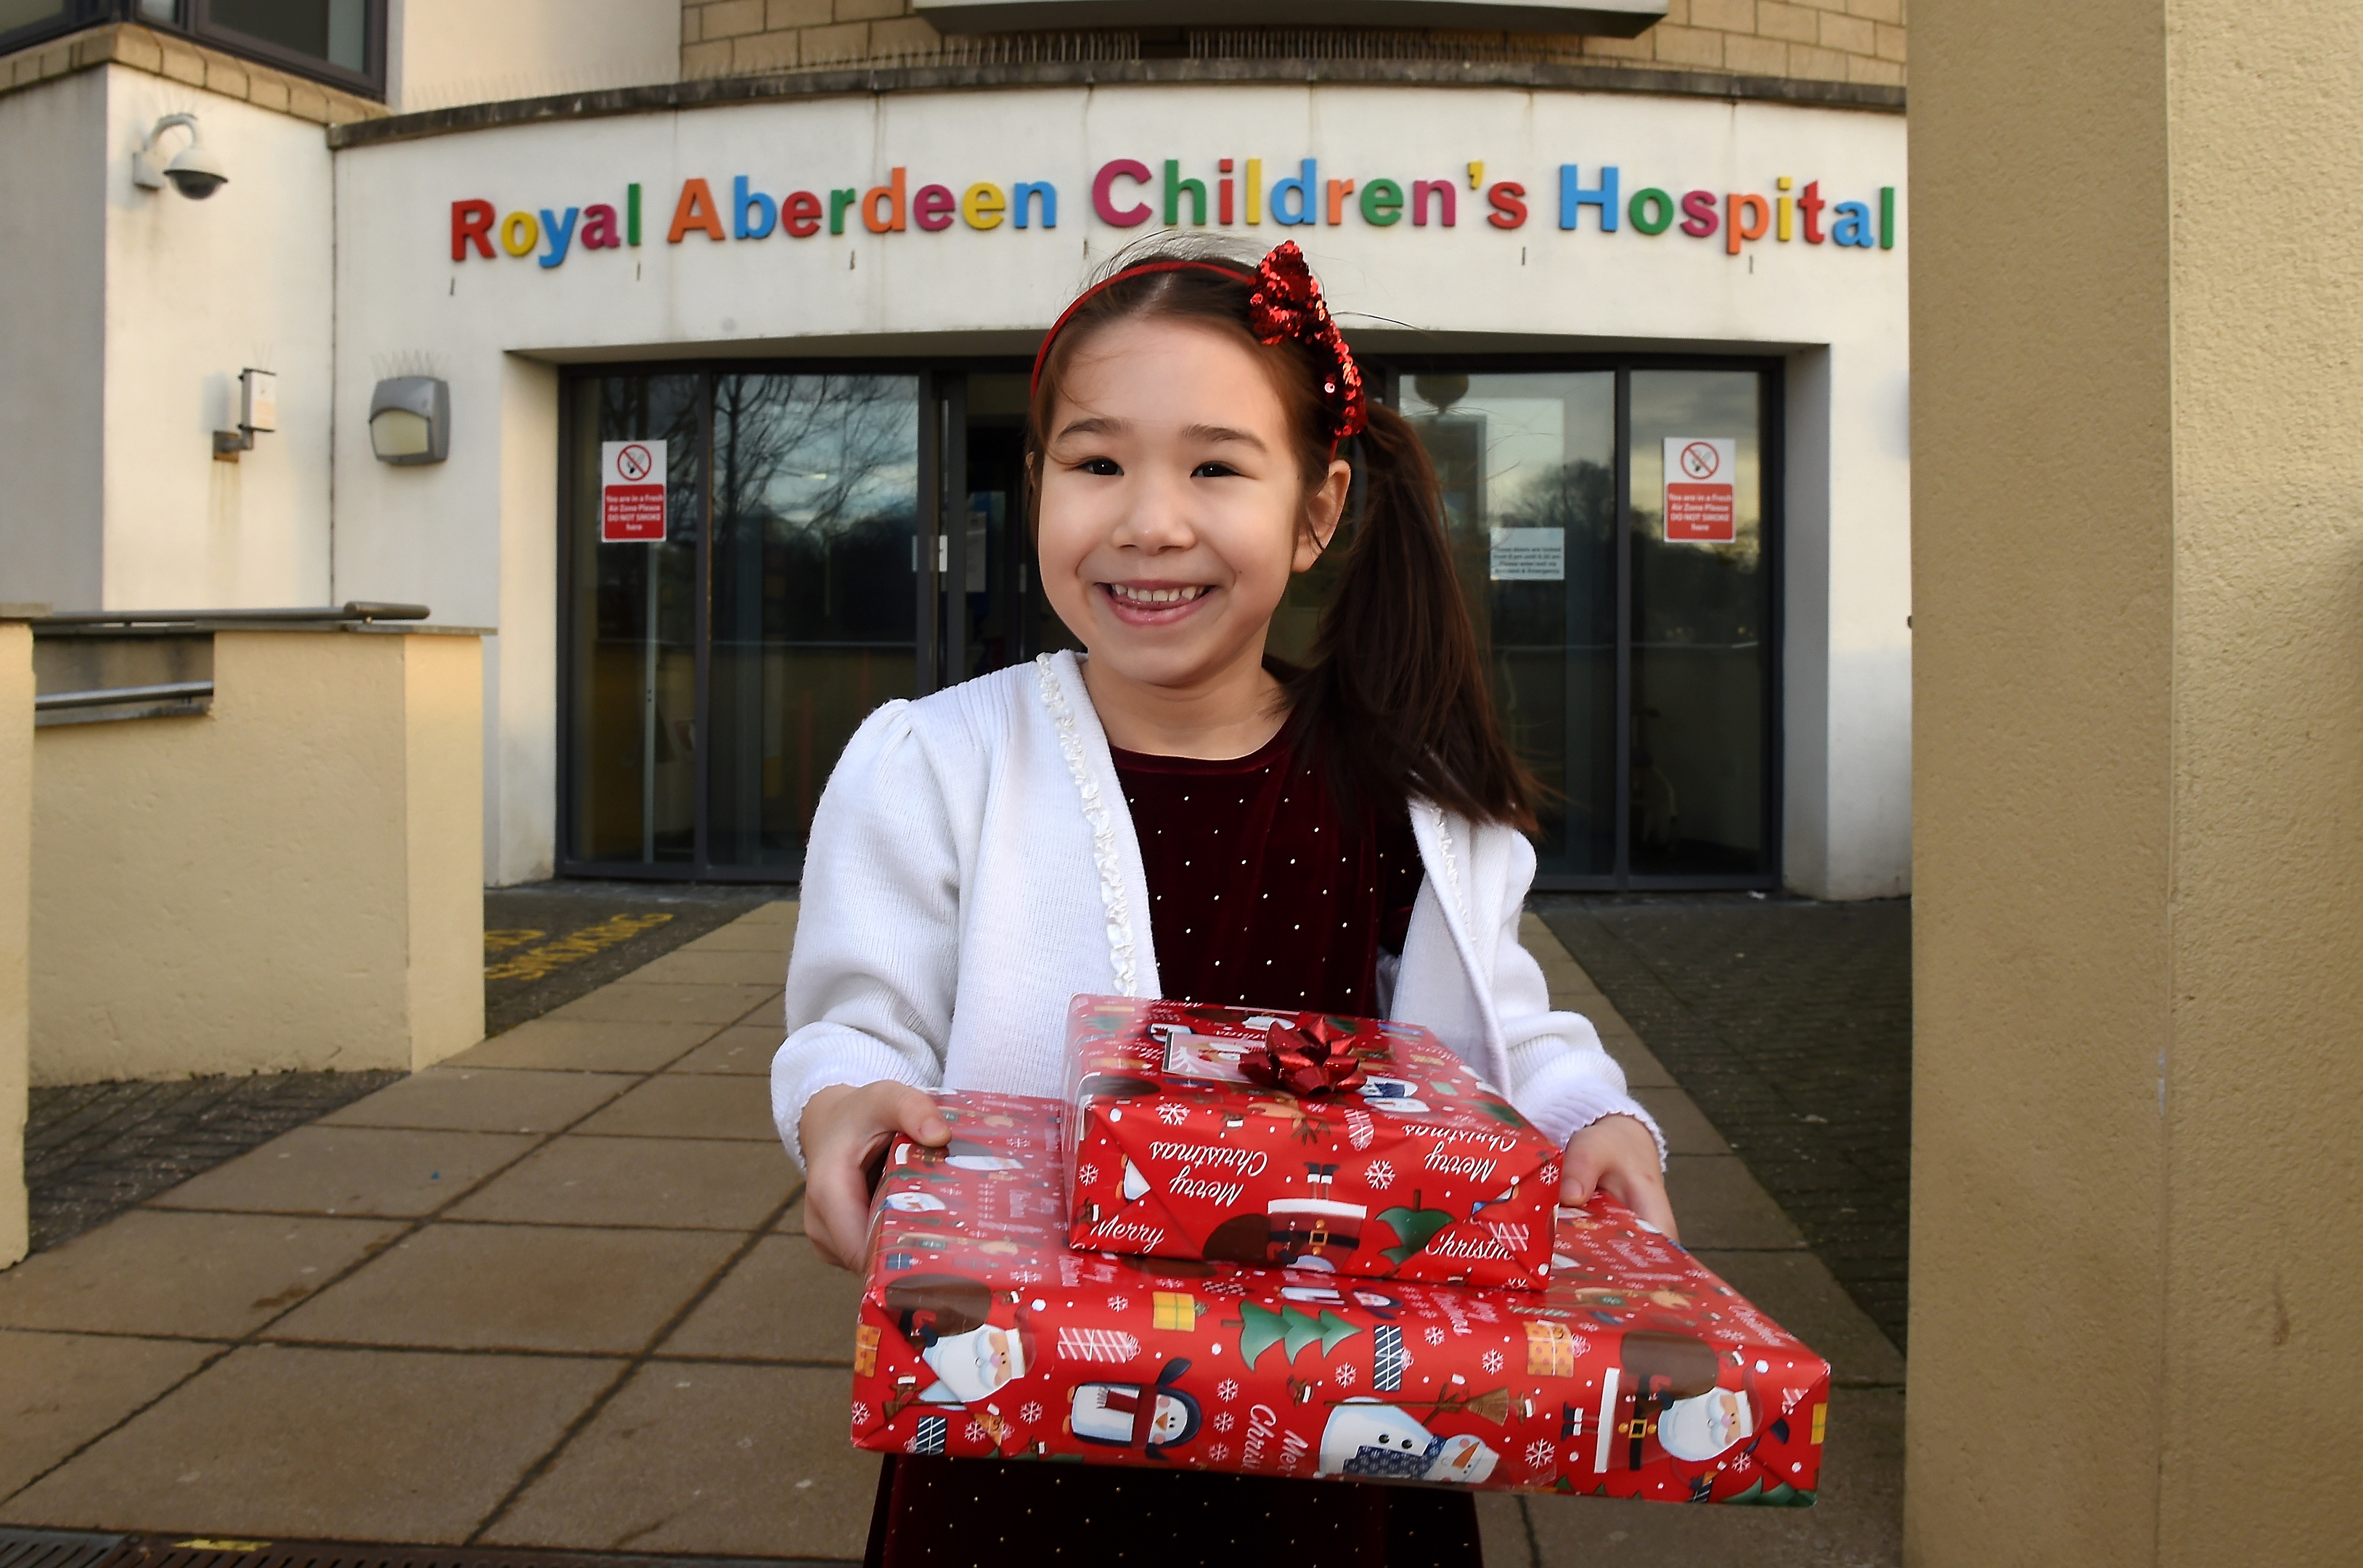 Jenny Cormack, 6, at Royal Aberdeen Children's Hospital.